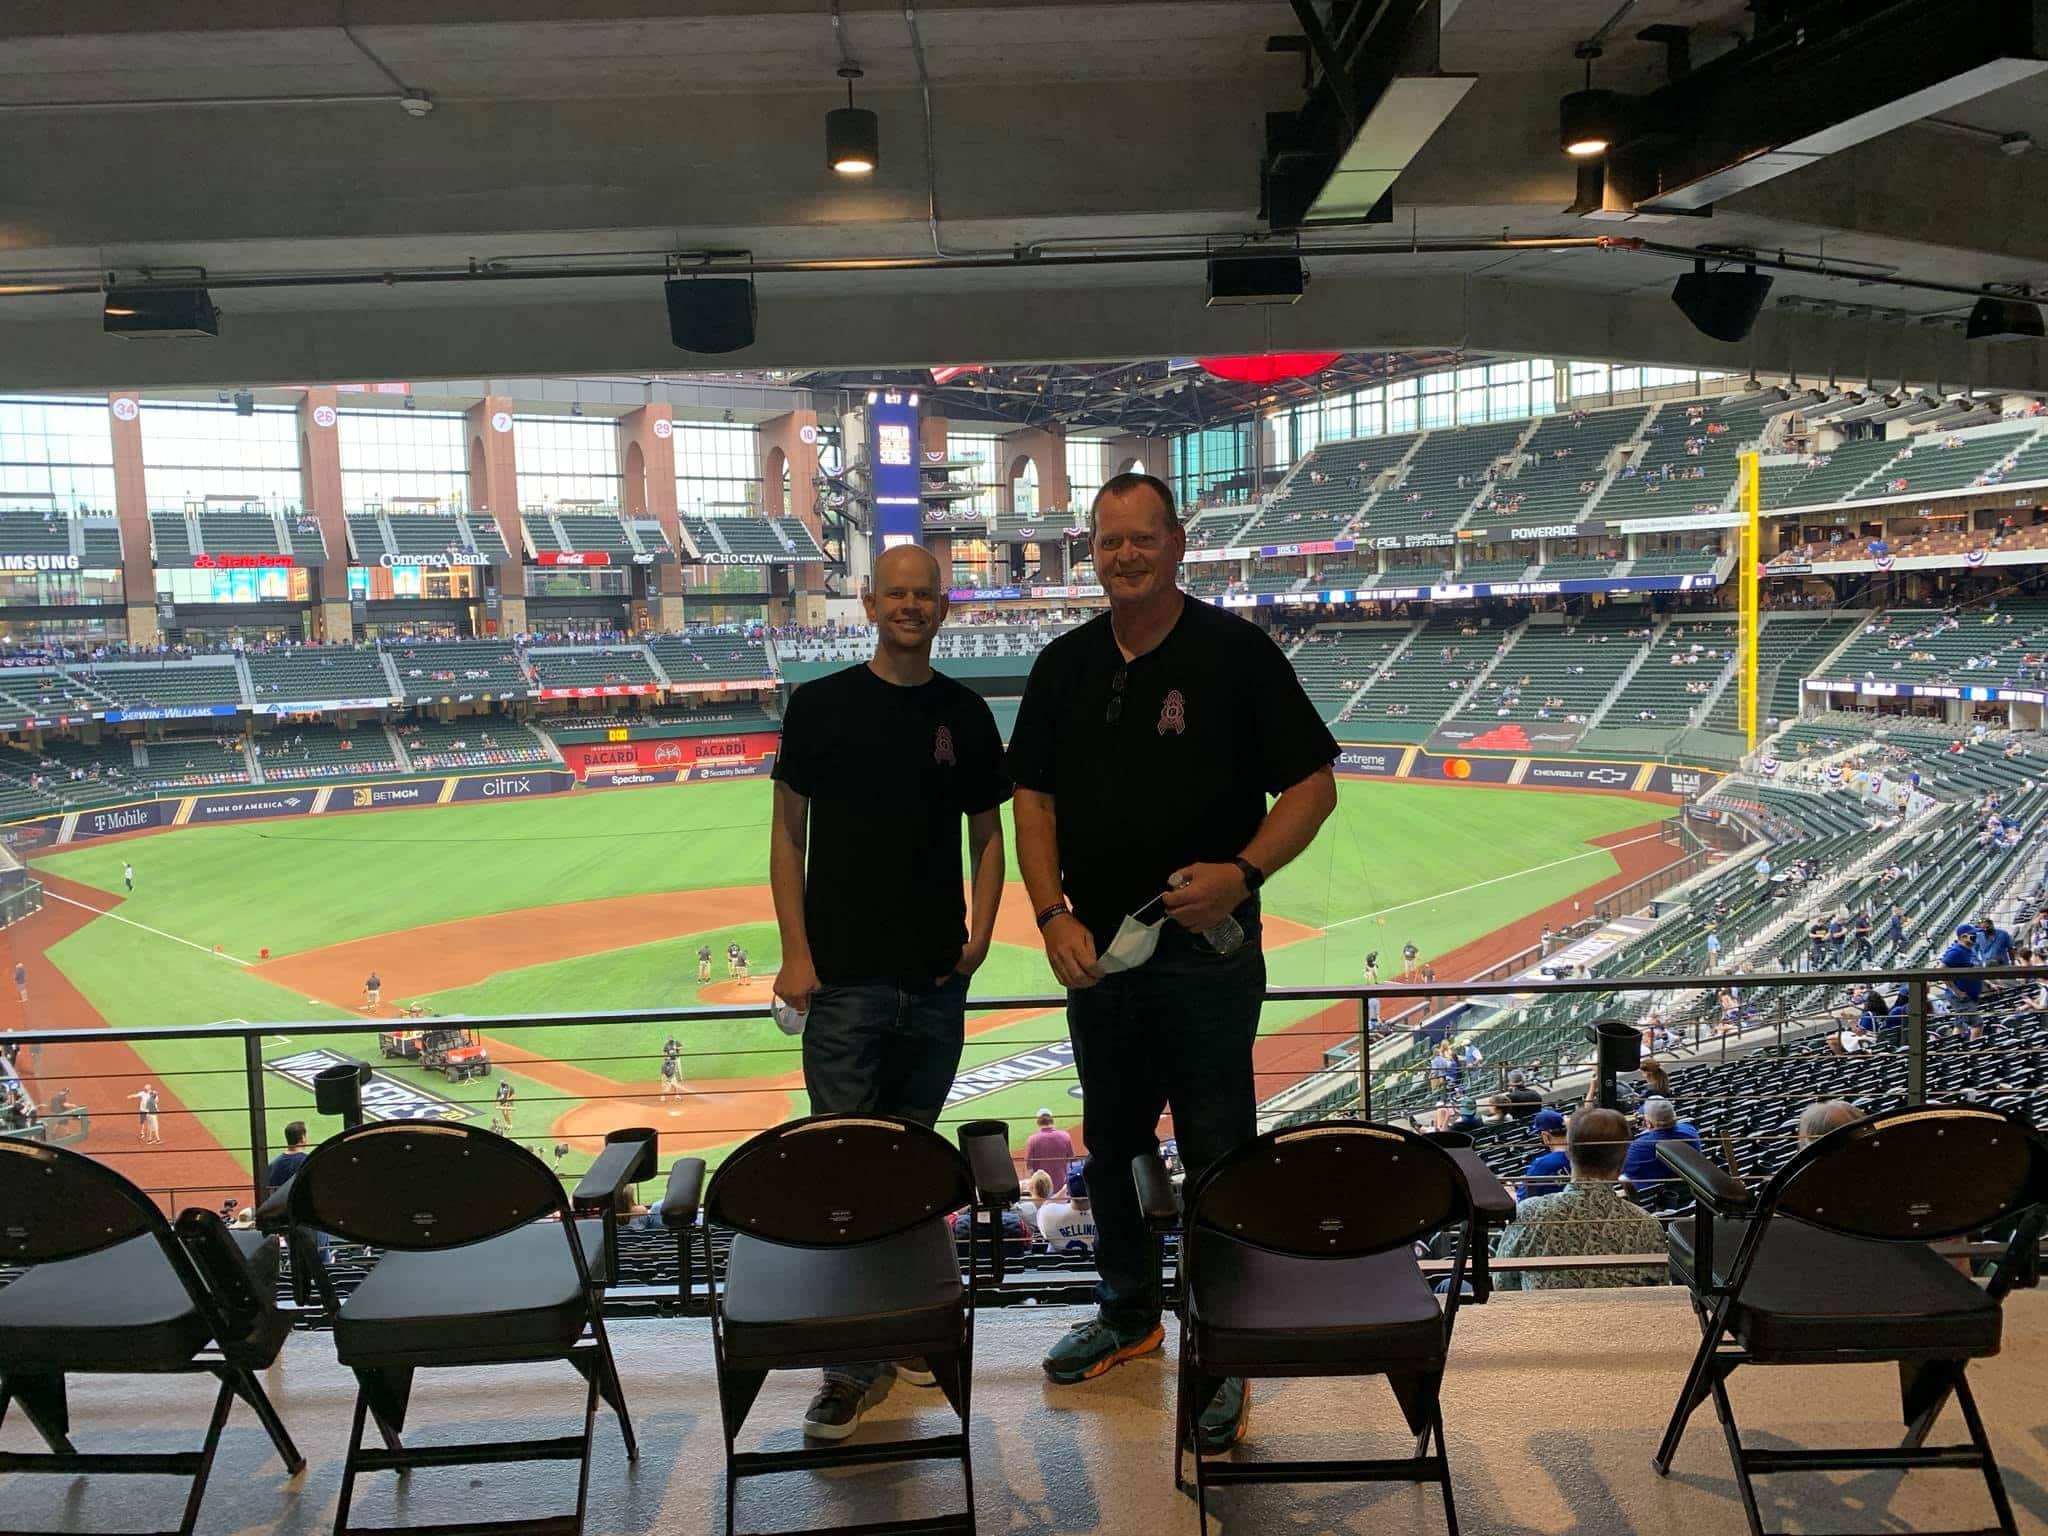 Brandon with Dad baseball stadium